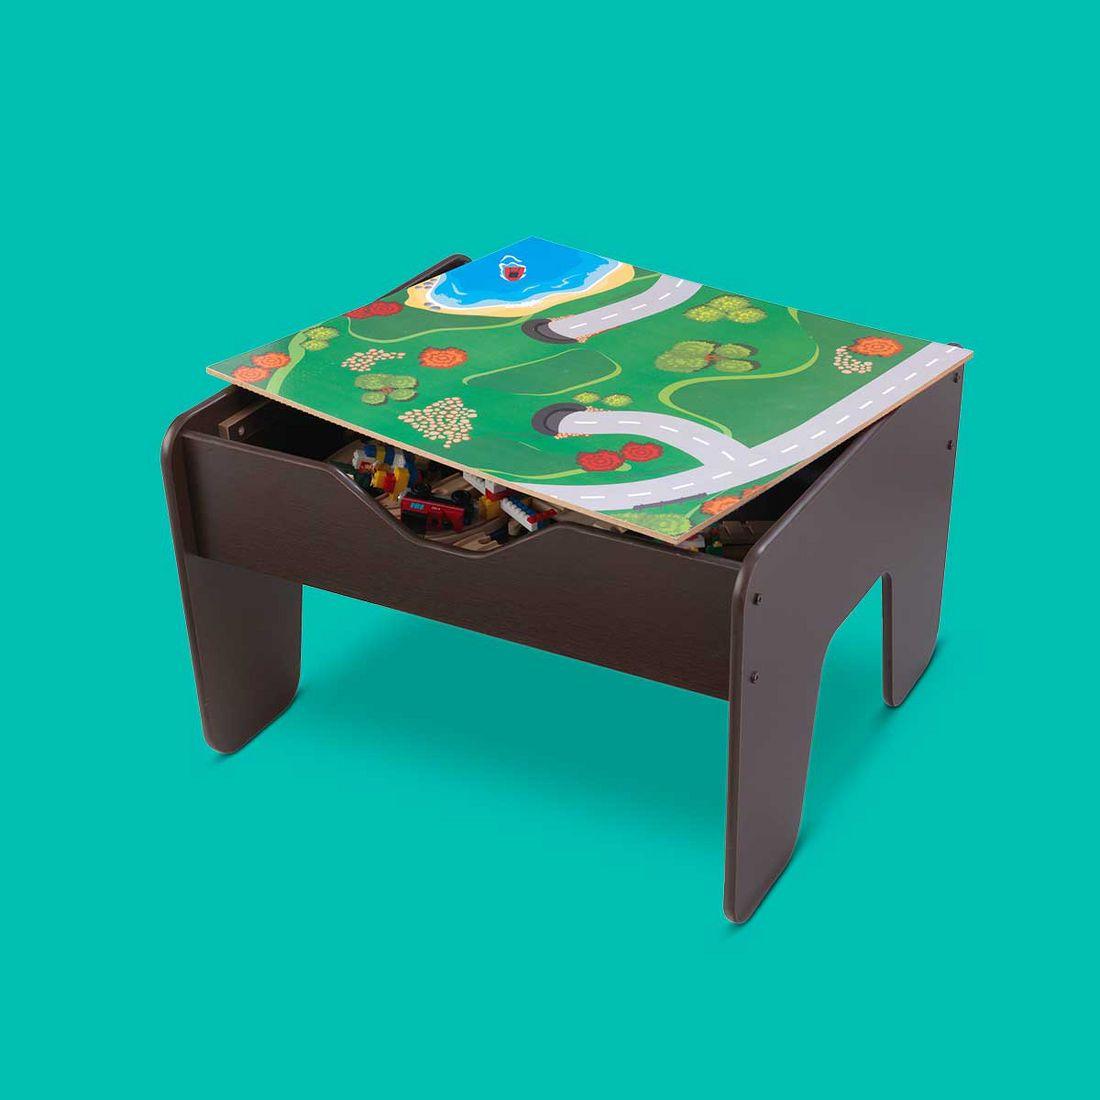 e8ee695d7a1c0 Toddler Toys   Target